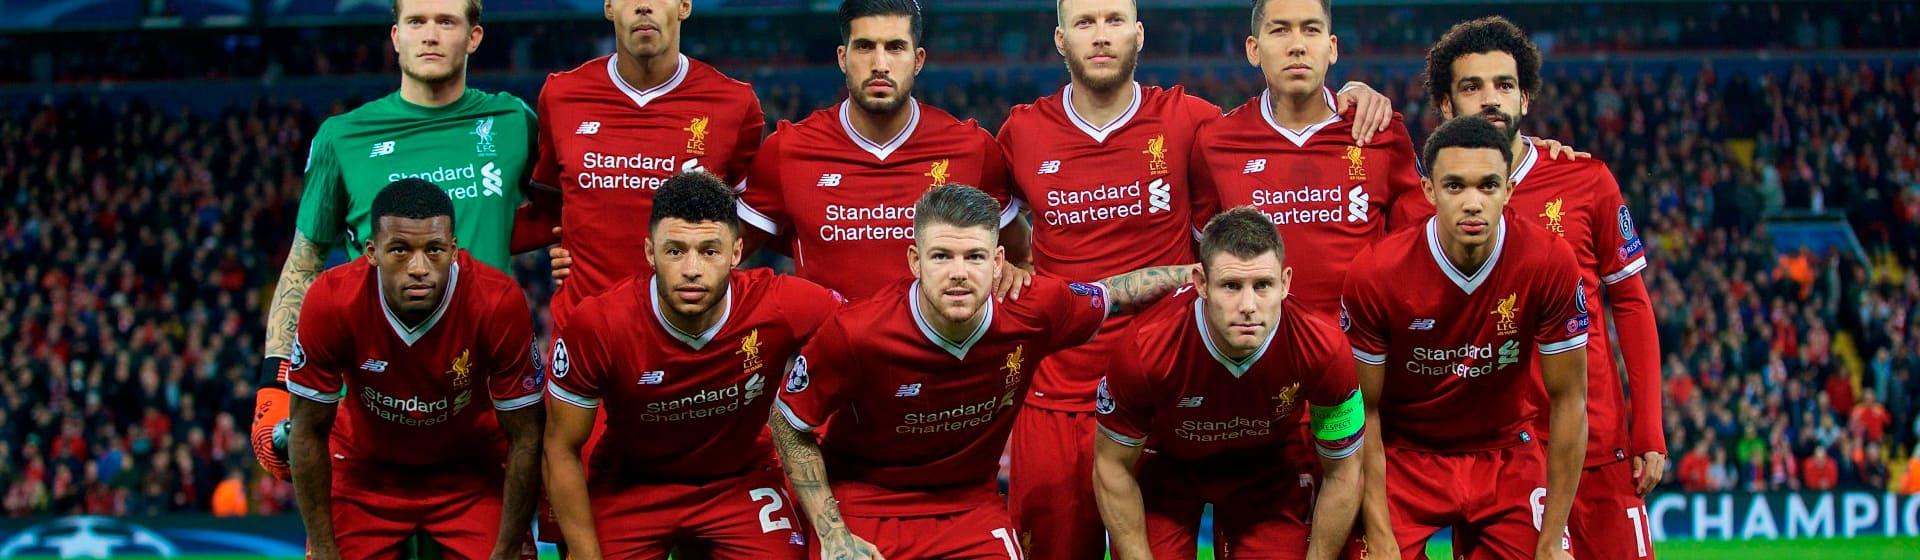 FC Liverpool - Мерч и одежда с атрибутикой